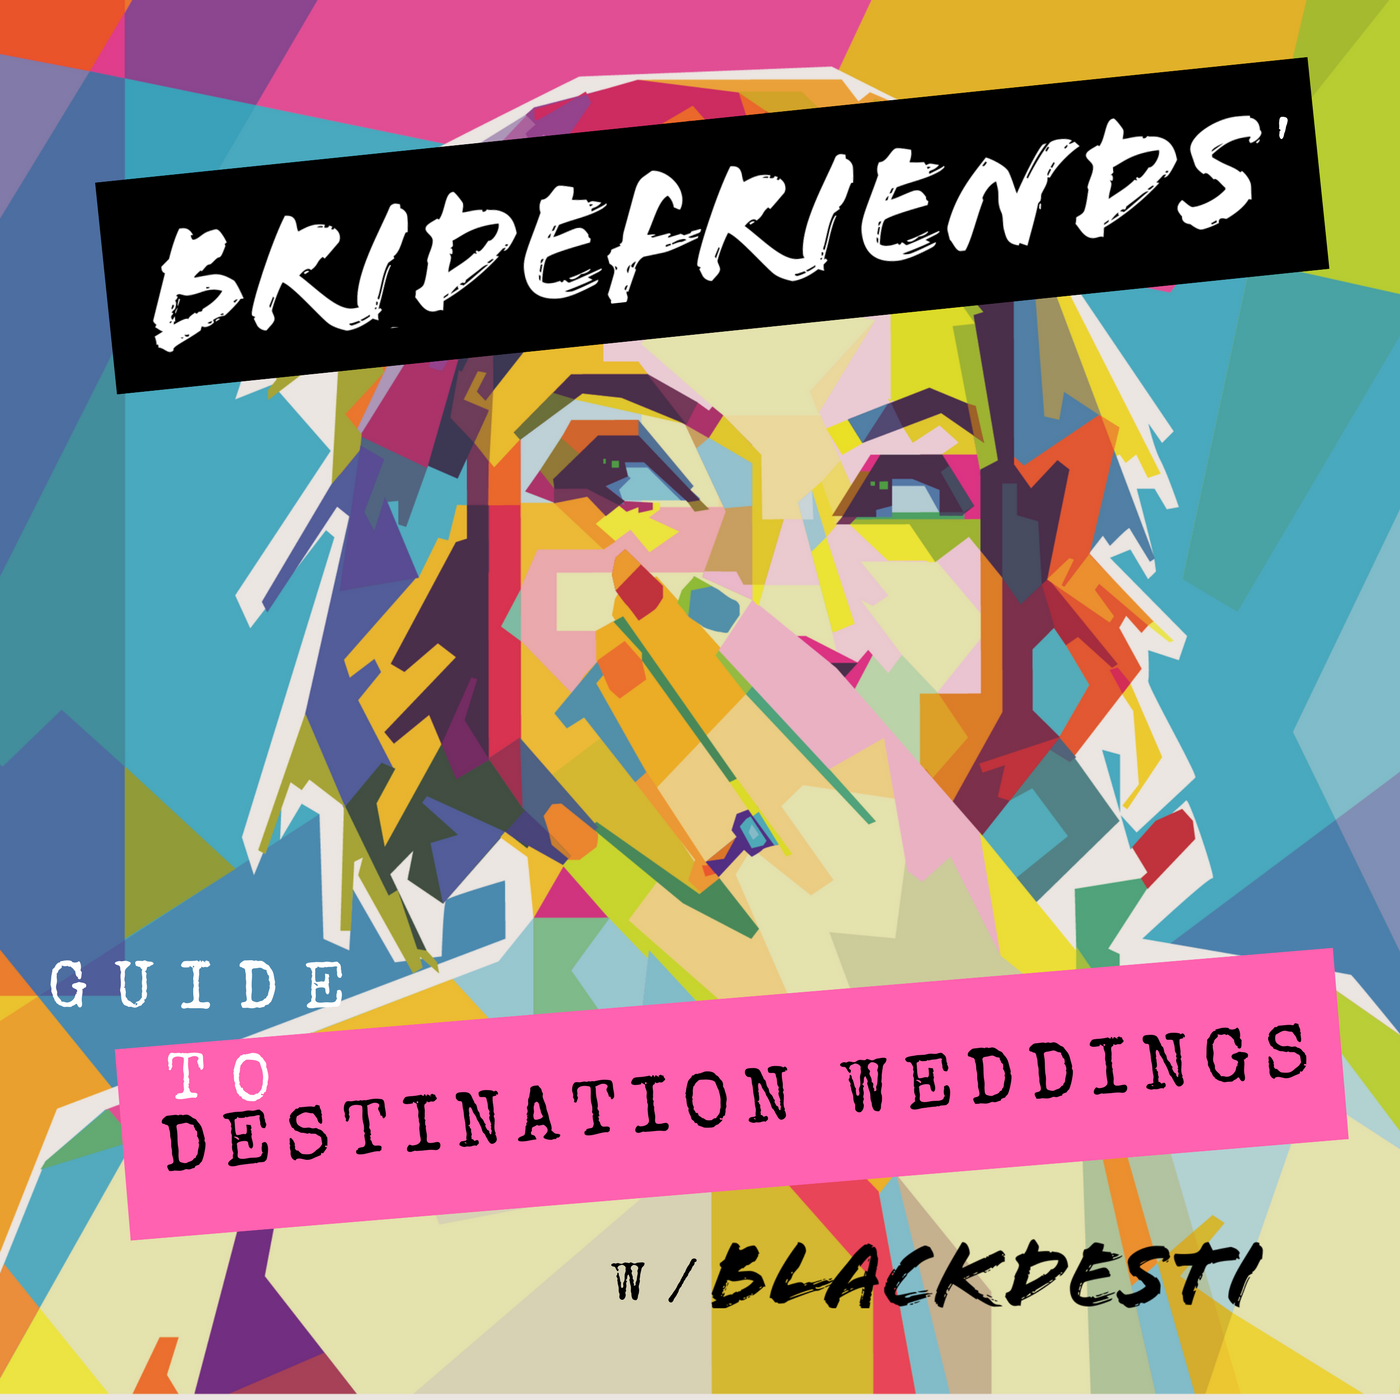 1400X1400 Artwork - BRIDEFRIENDS' GUIDE TO DESTINATION WEDDINGS Podcast copy.png